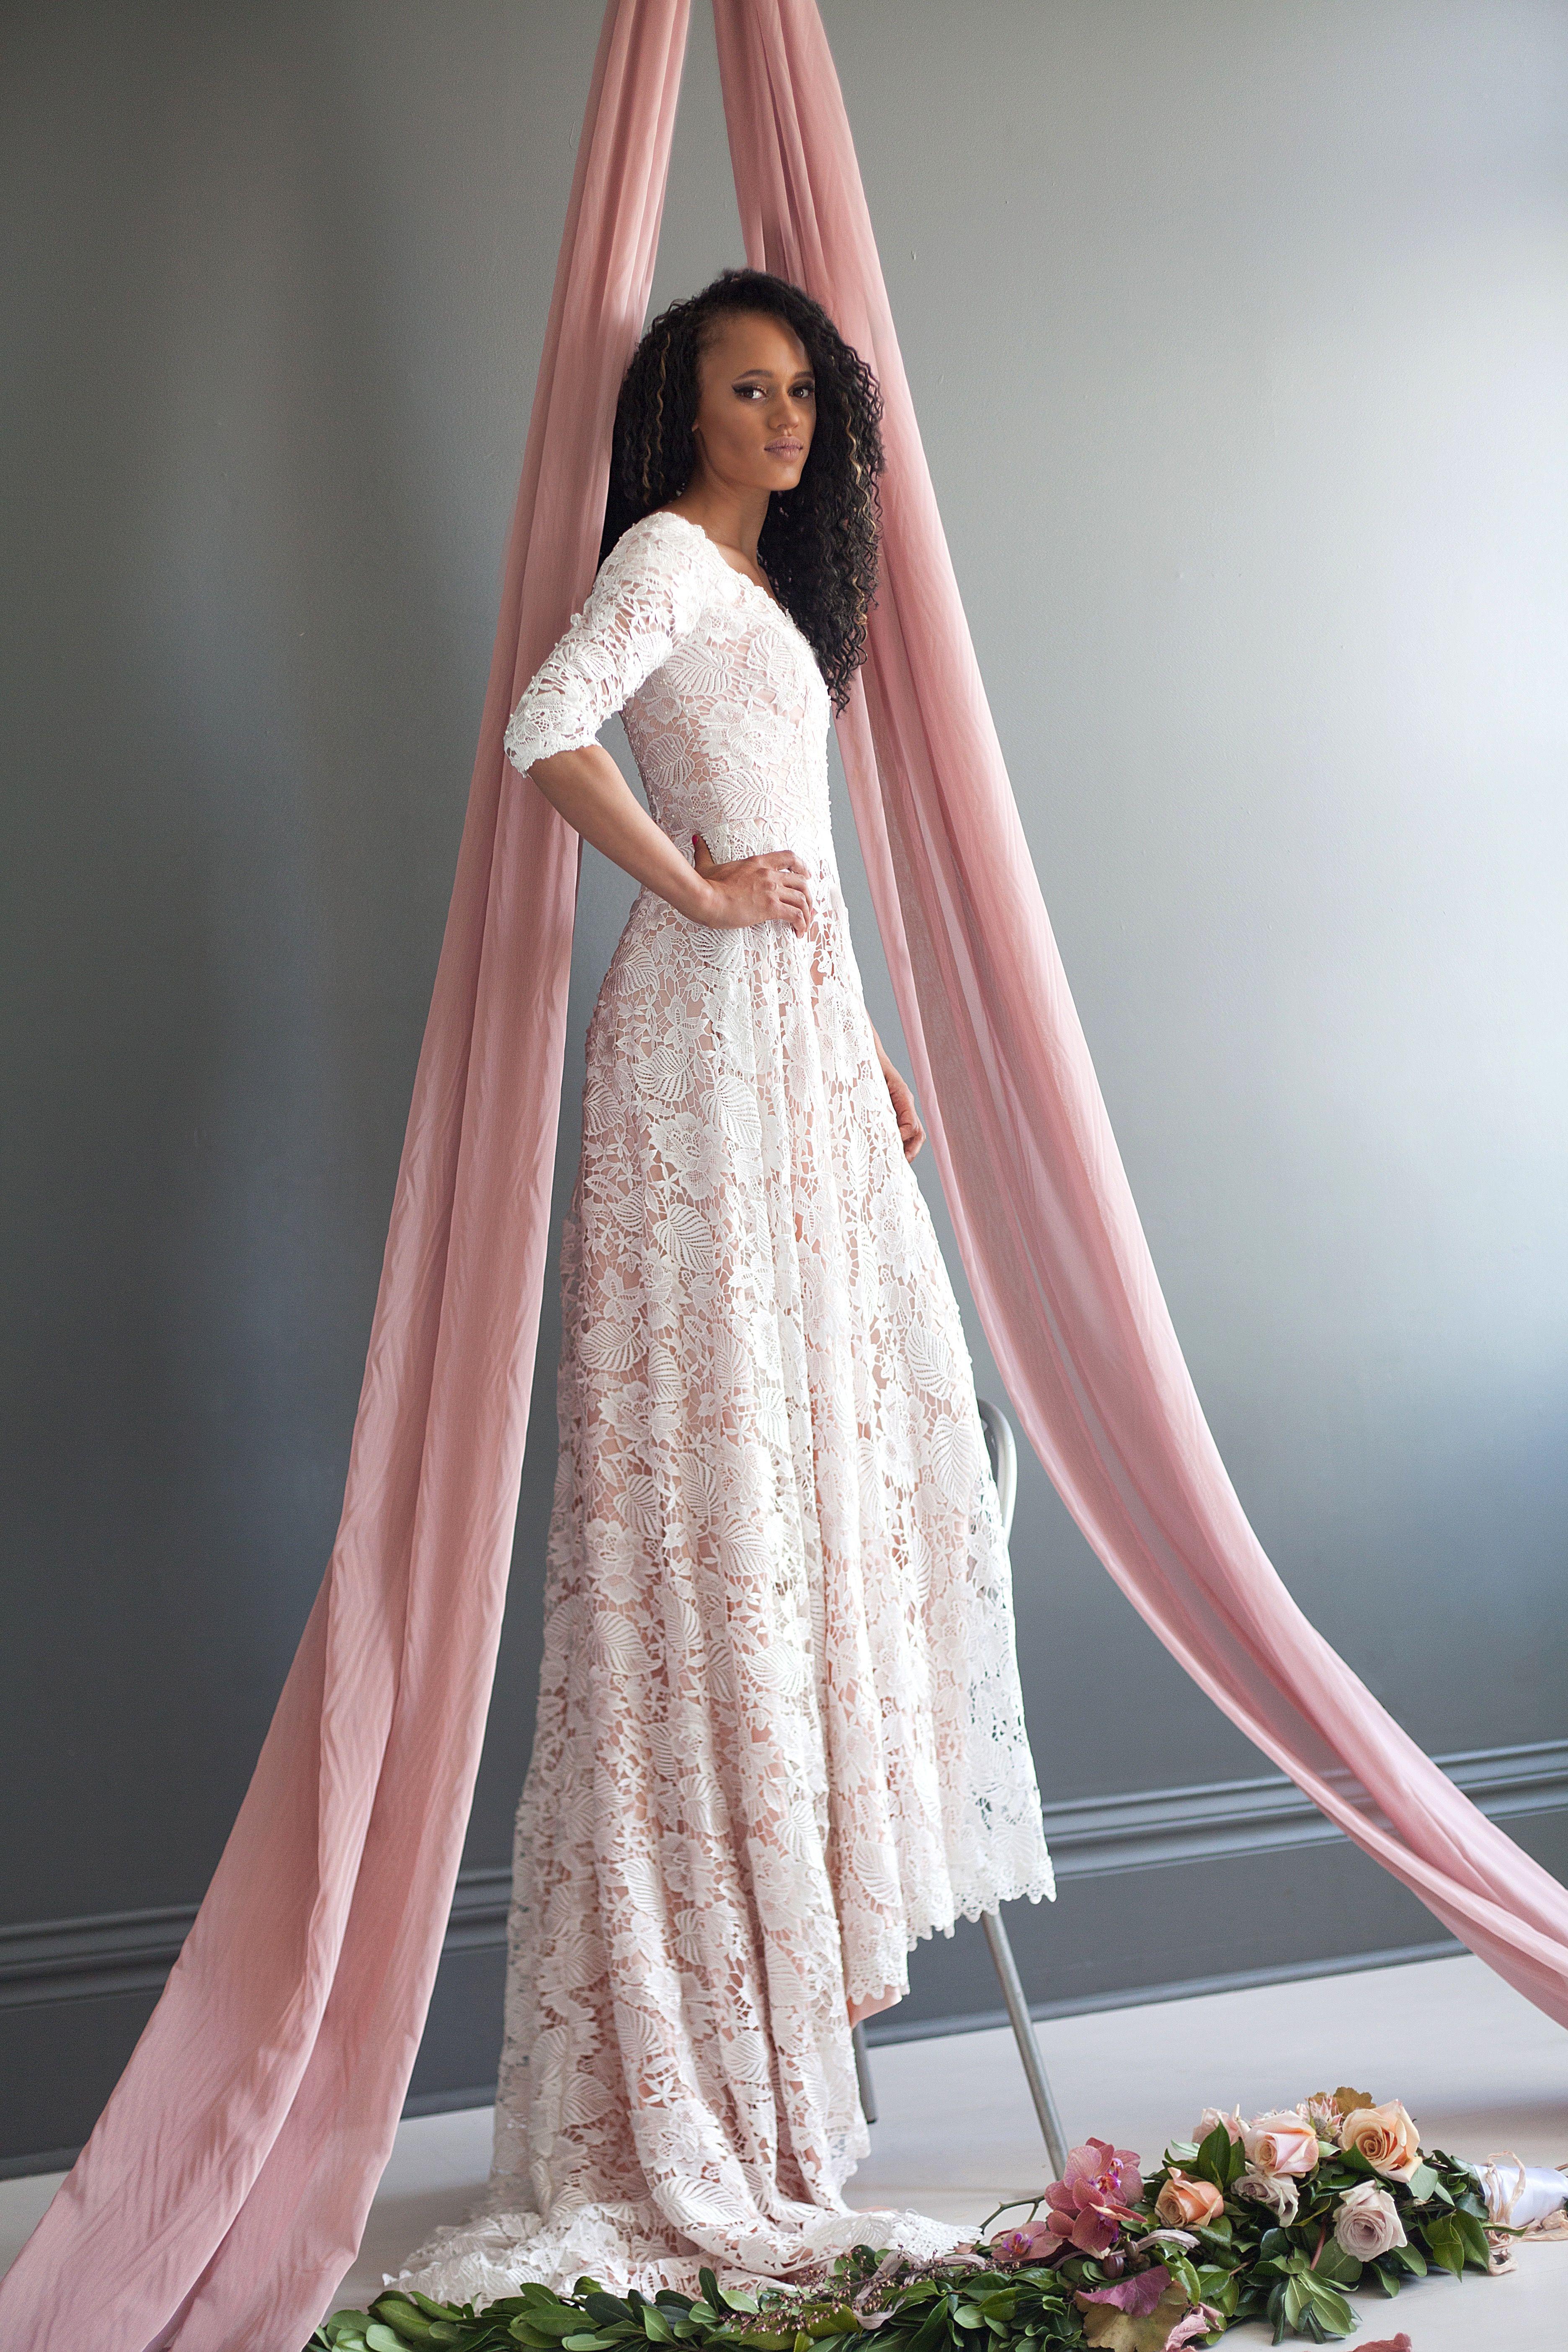 Nicole gown by Elizabeth Cooper Design   Photo by Ali Brown Studios ...